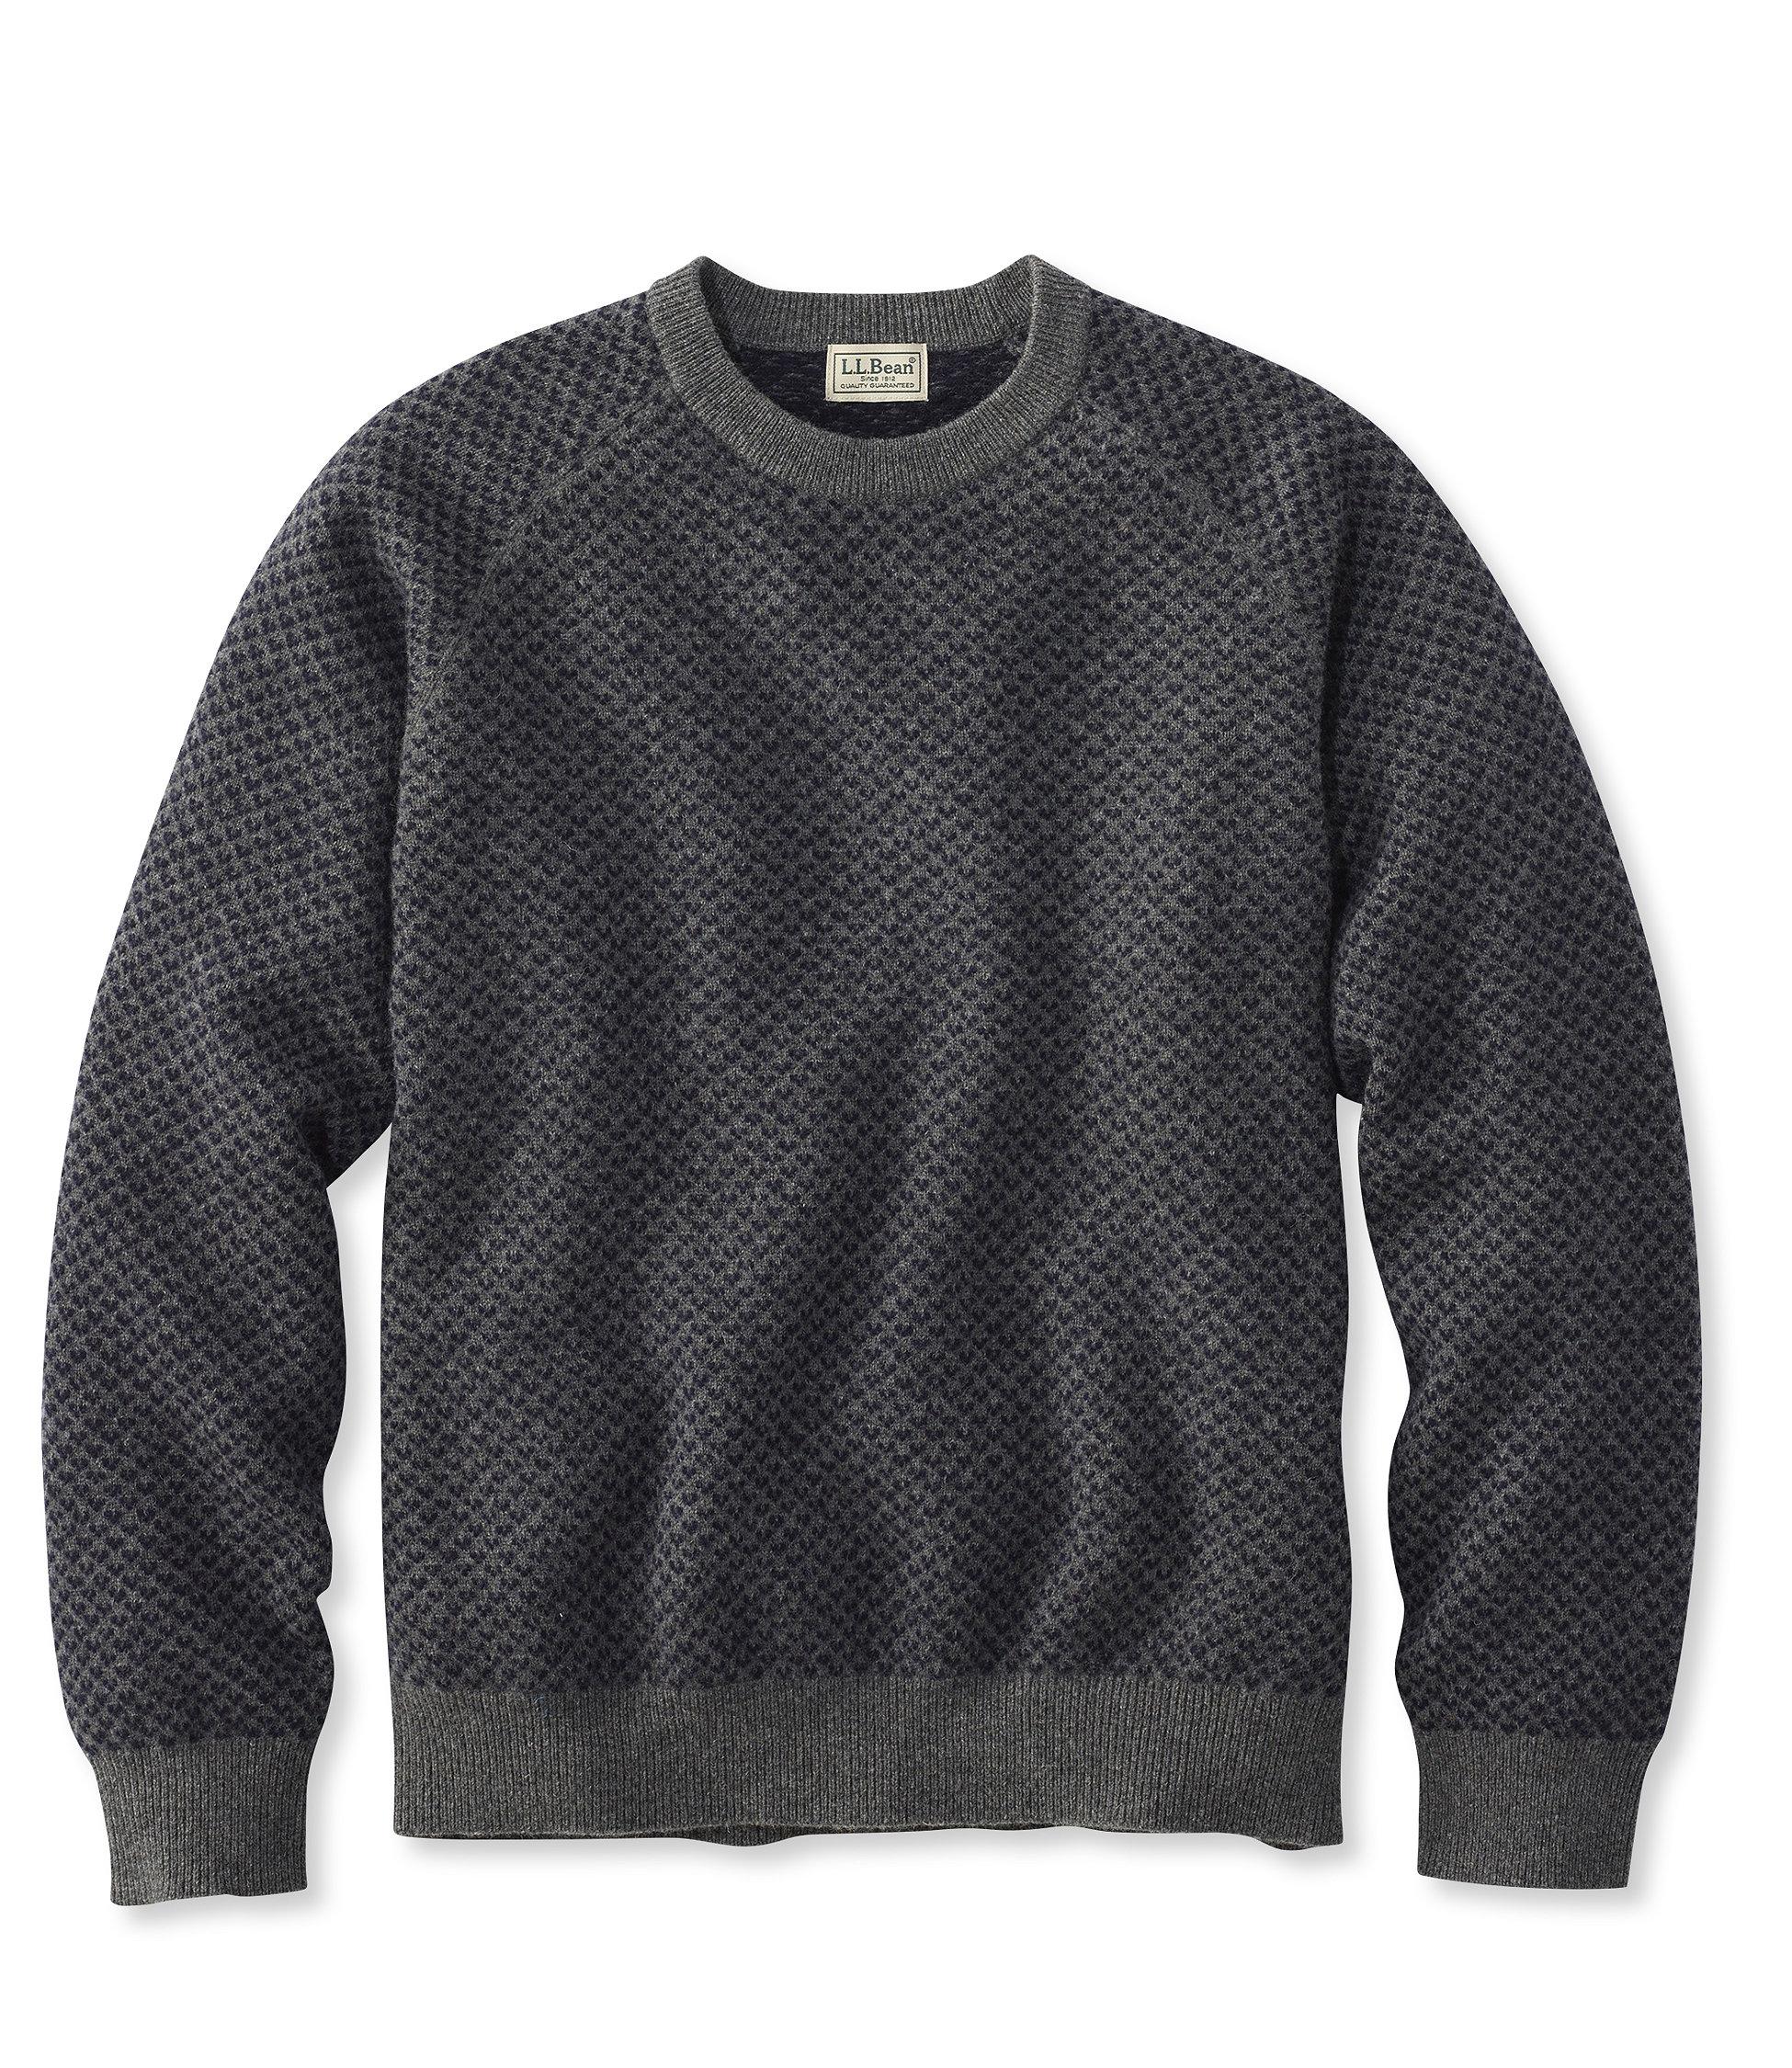 L.L.Bean Lambswool Crewneck Sweater